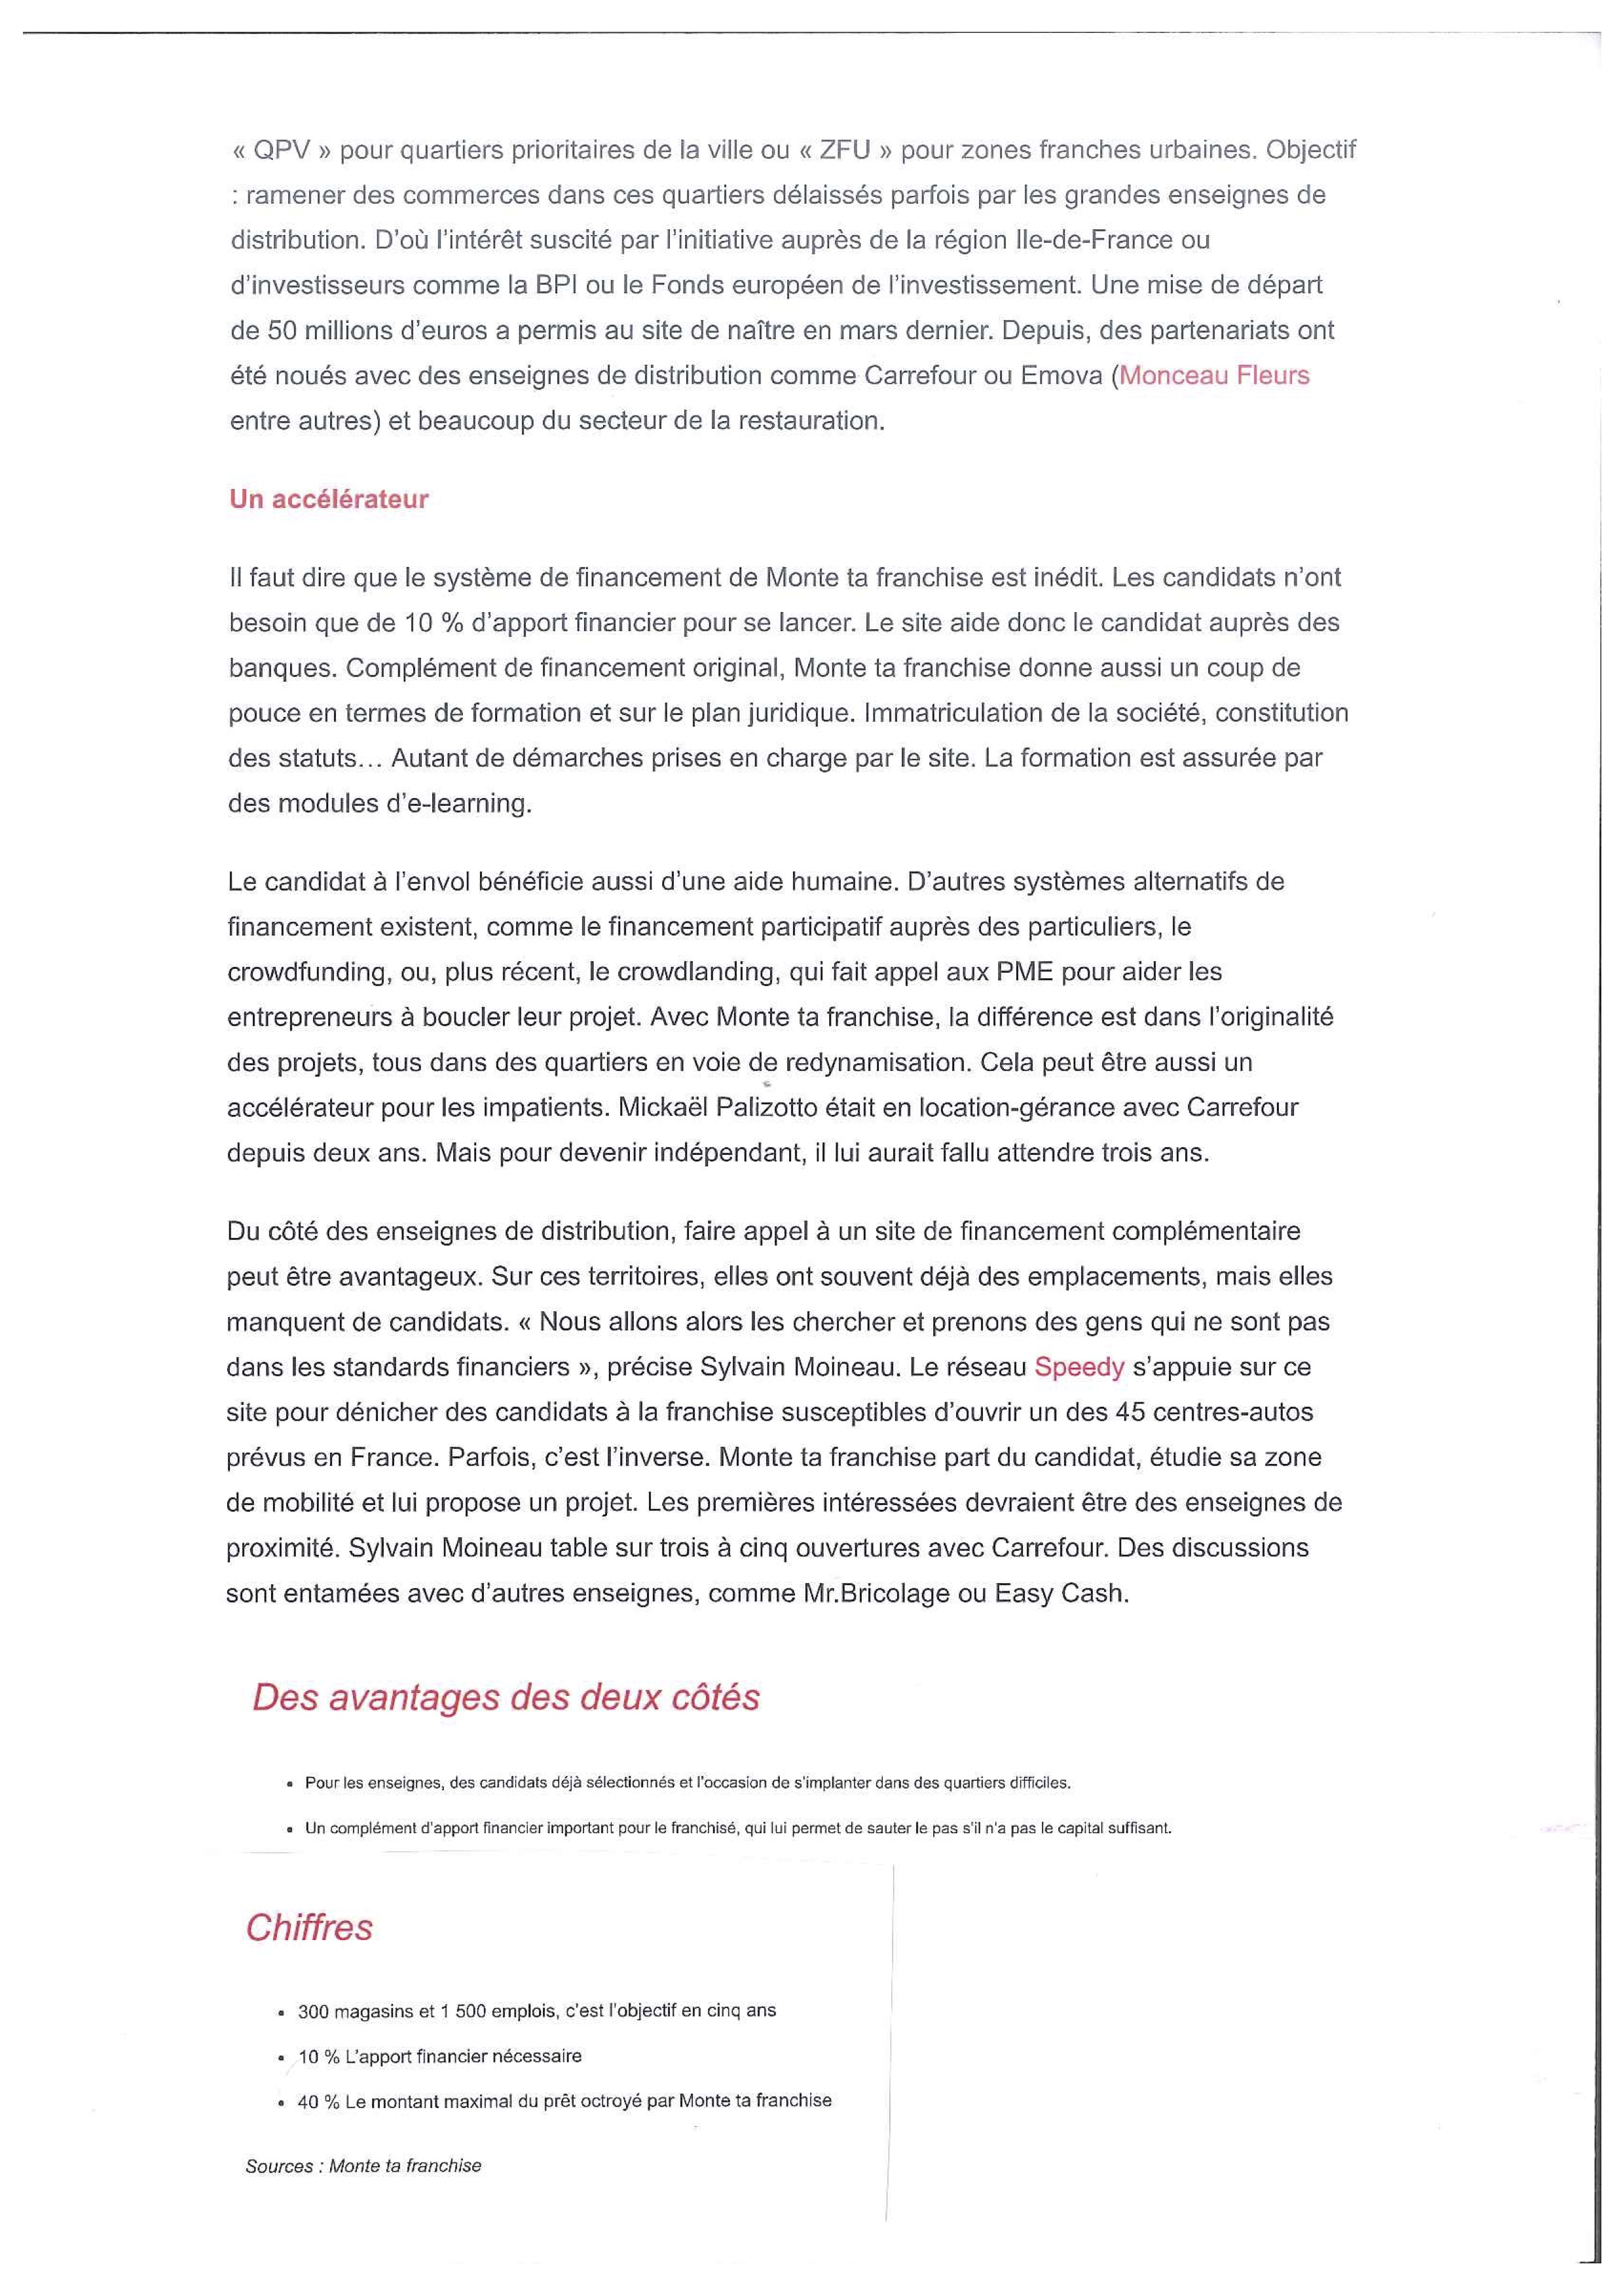 20171123_LSA_Carrefour-Bonneuil 2.jpg